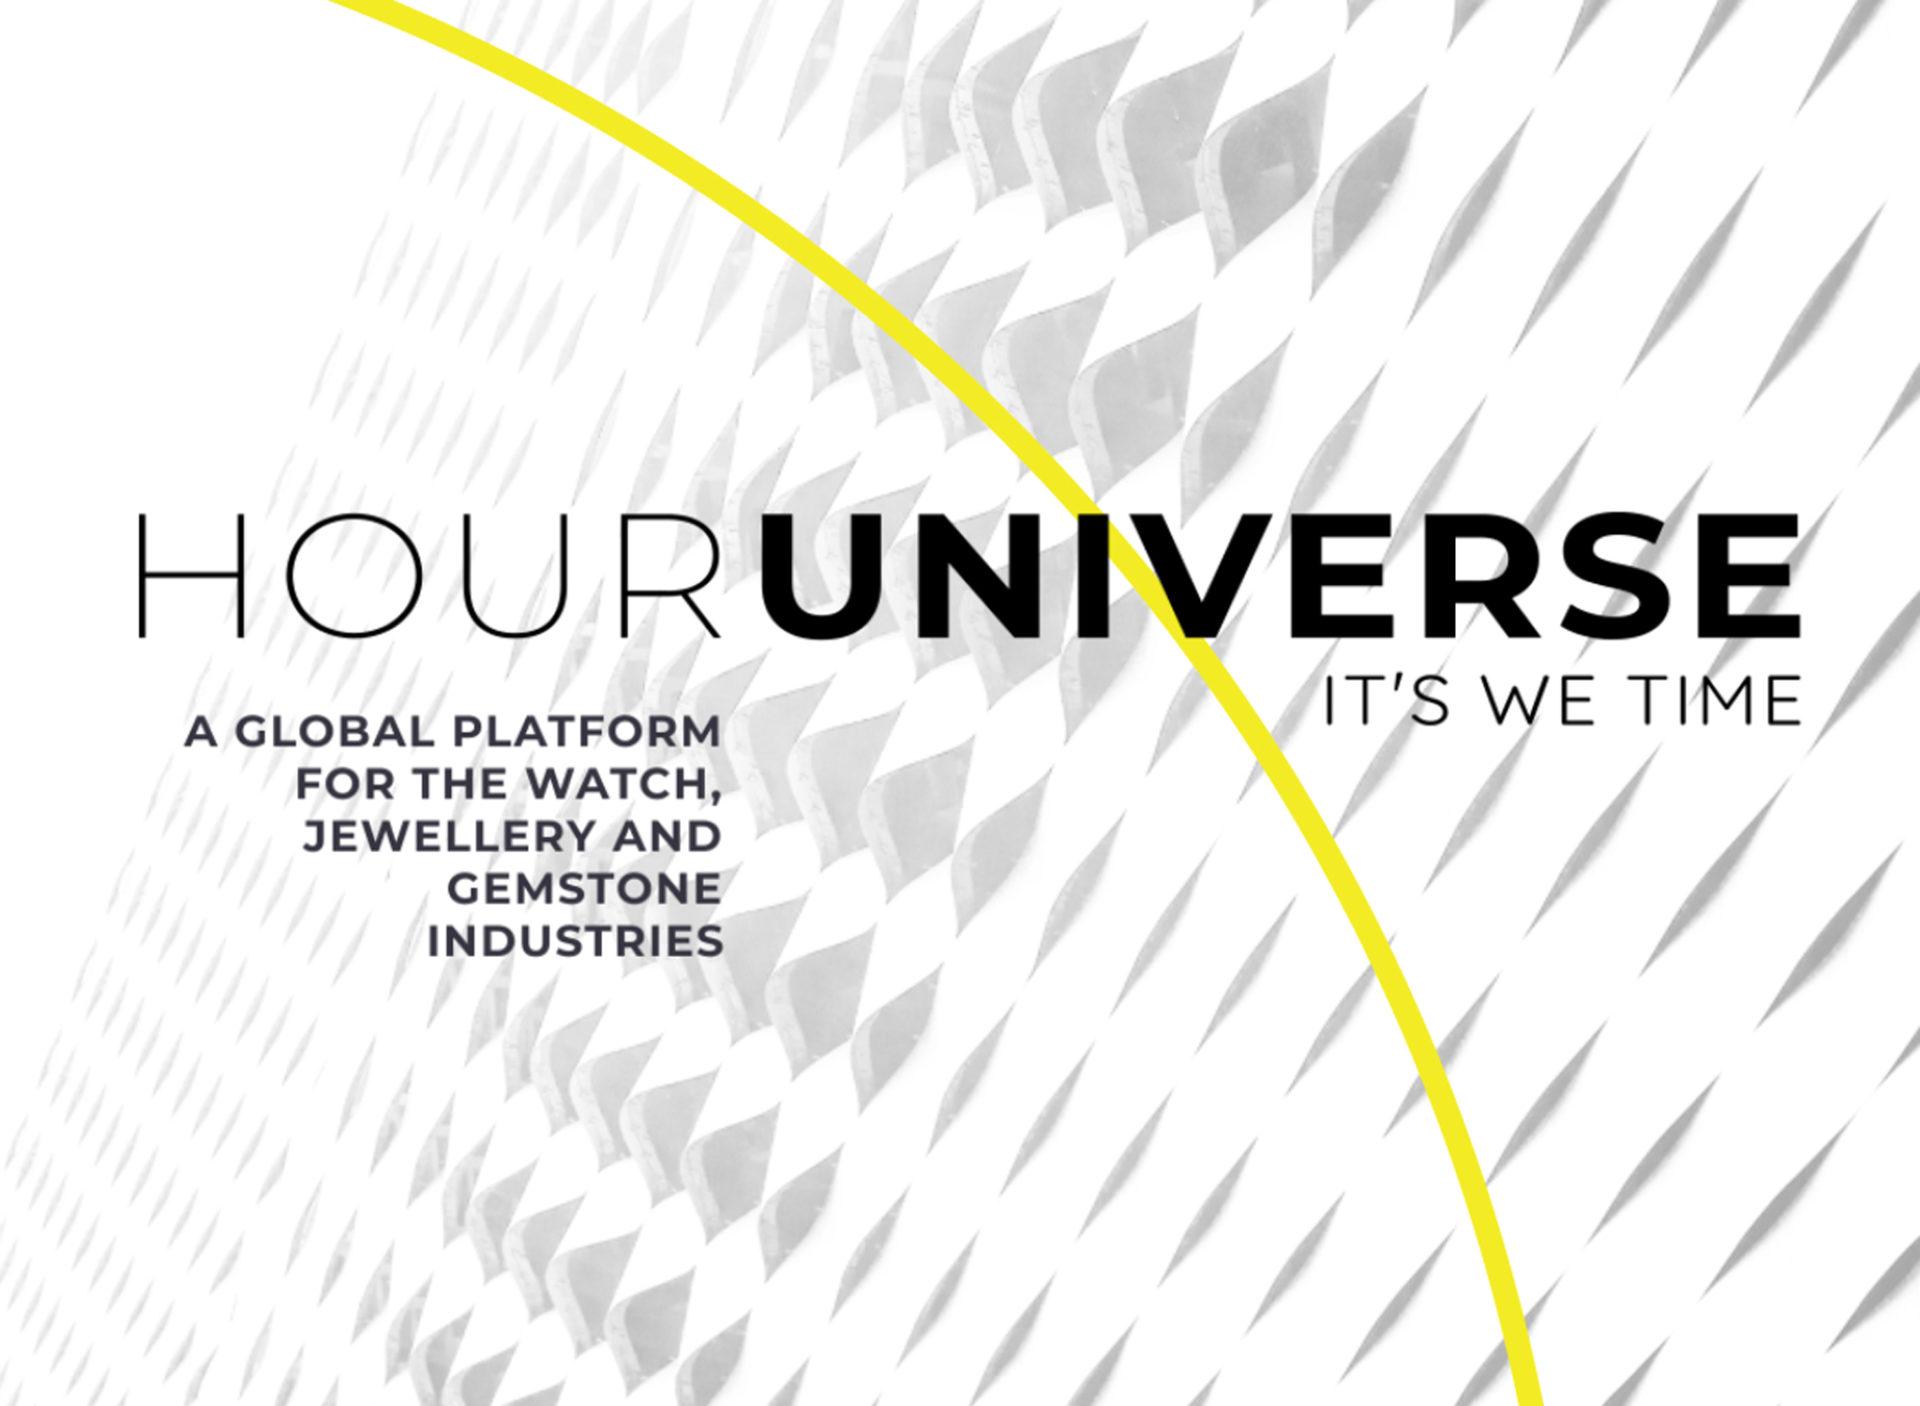 HourUniverse homepage